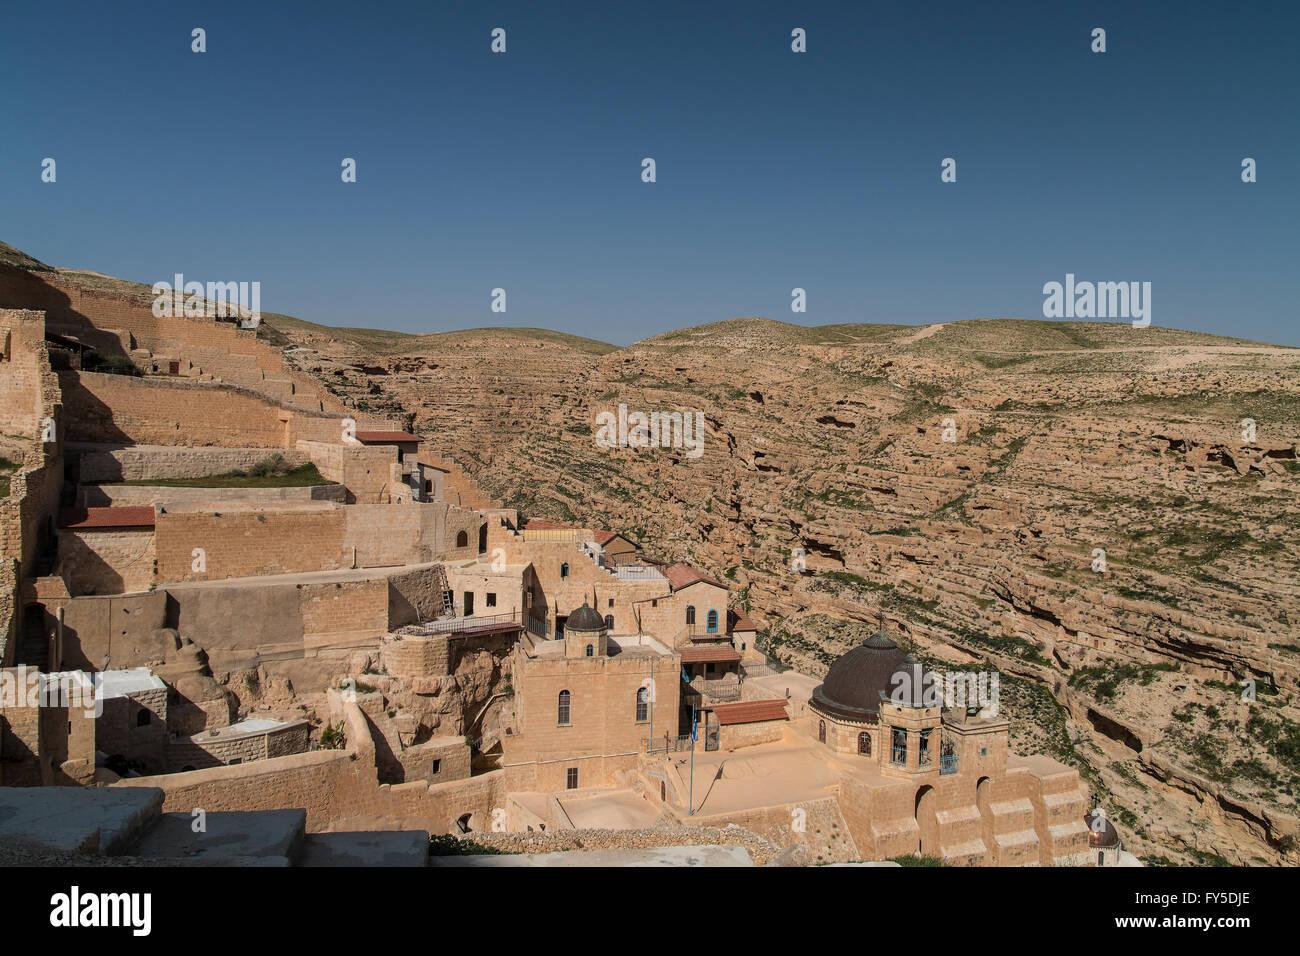 Mar Saba Greek Orthodox monastery Kidron Valley Palestine Stock Photo